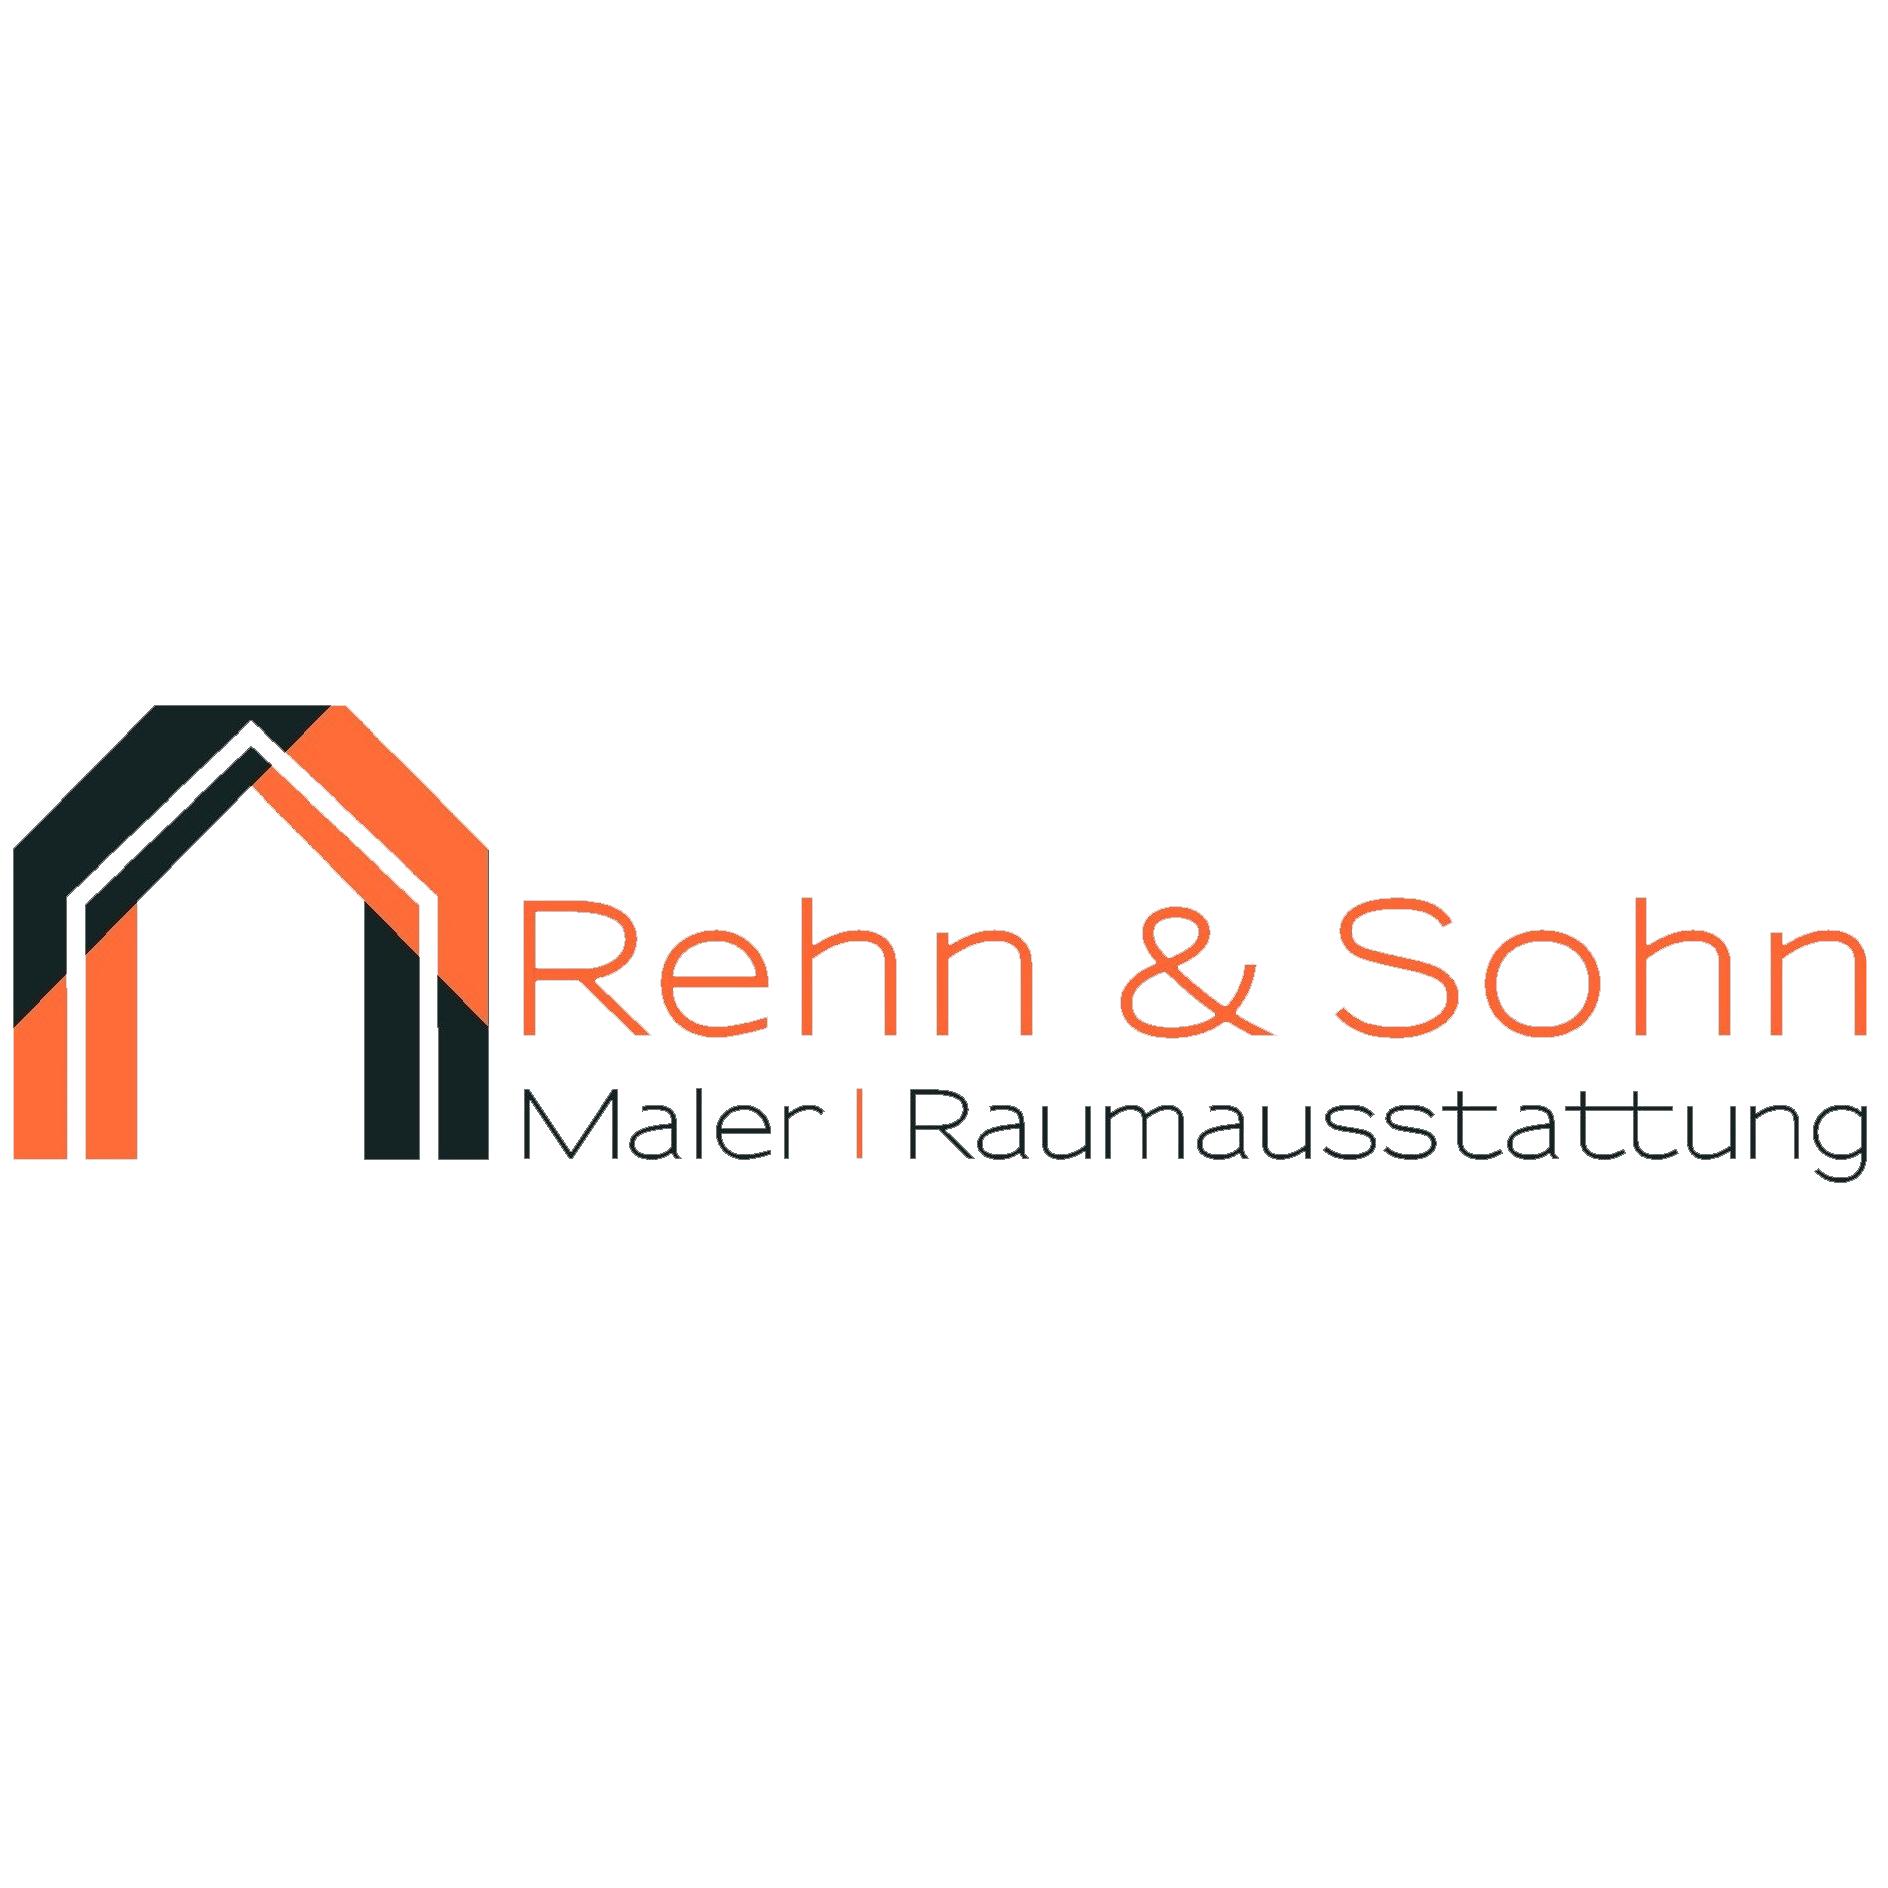 Bild zu Rehn & Sohn GmbH Meisterbetrieb in Heilbronn am Neckar